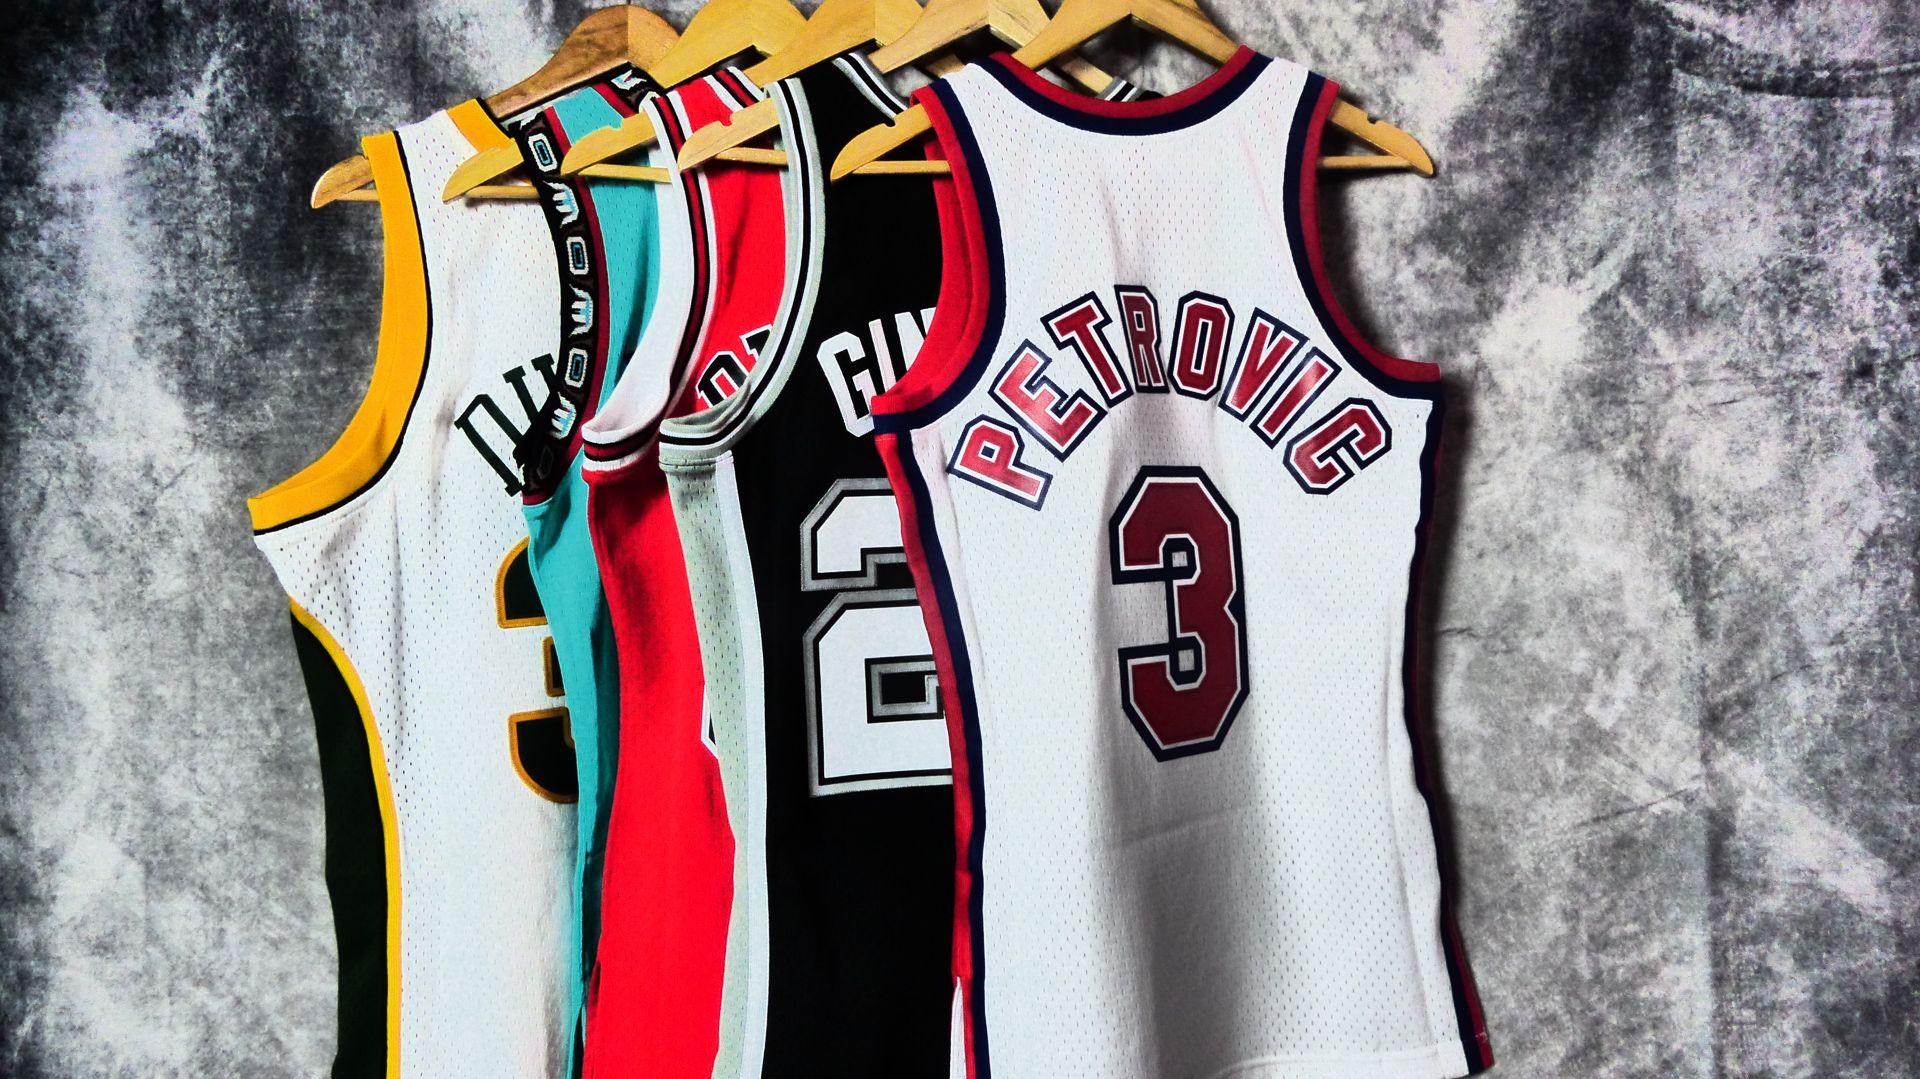 83cb6b6bfa1e Hardwood Classics. Camisetas retro NBA. Otoño 2018.  BasketspiritMadrid   Hardwoodclassics  drazenpetrovic